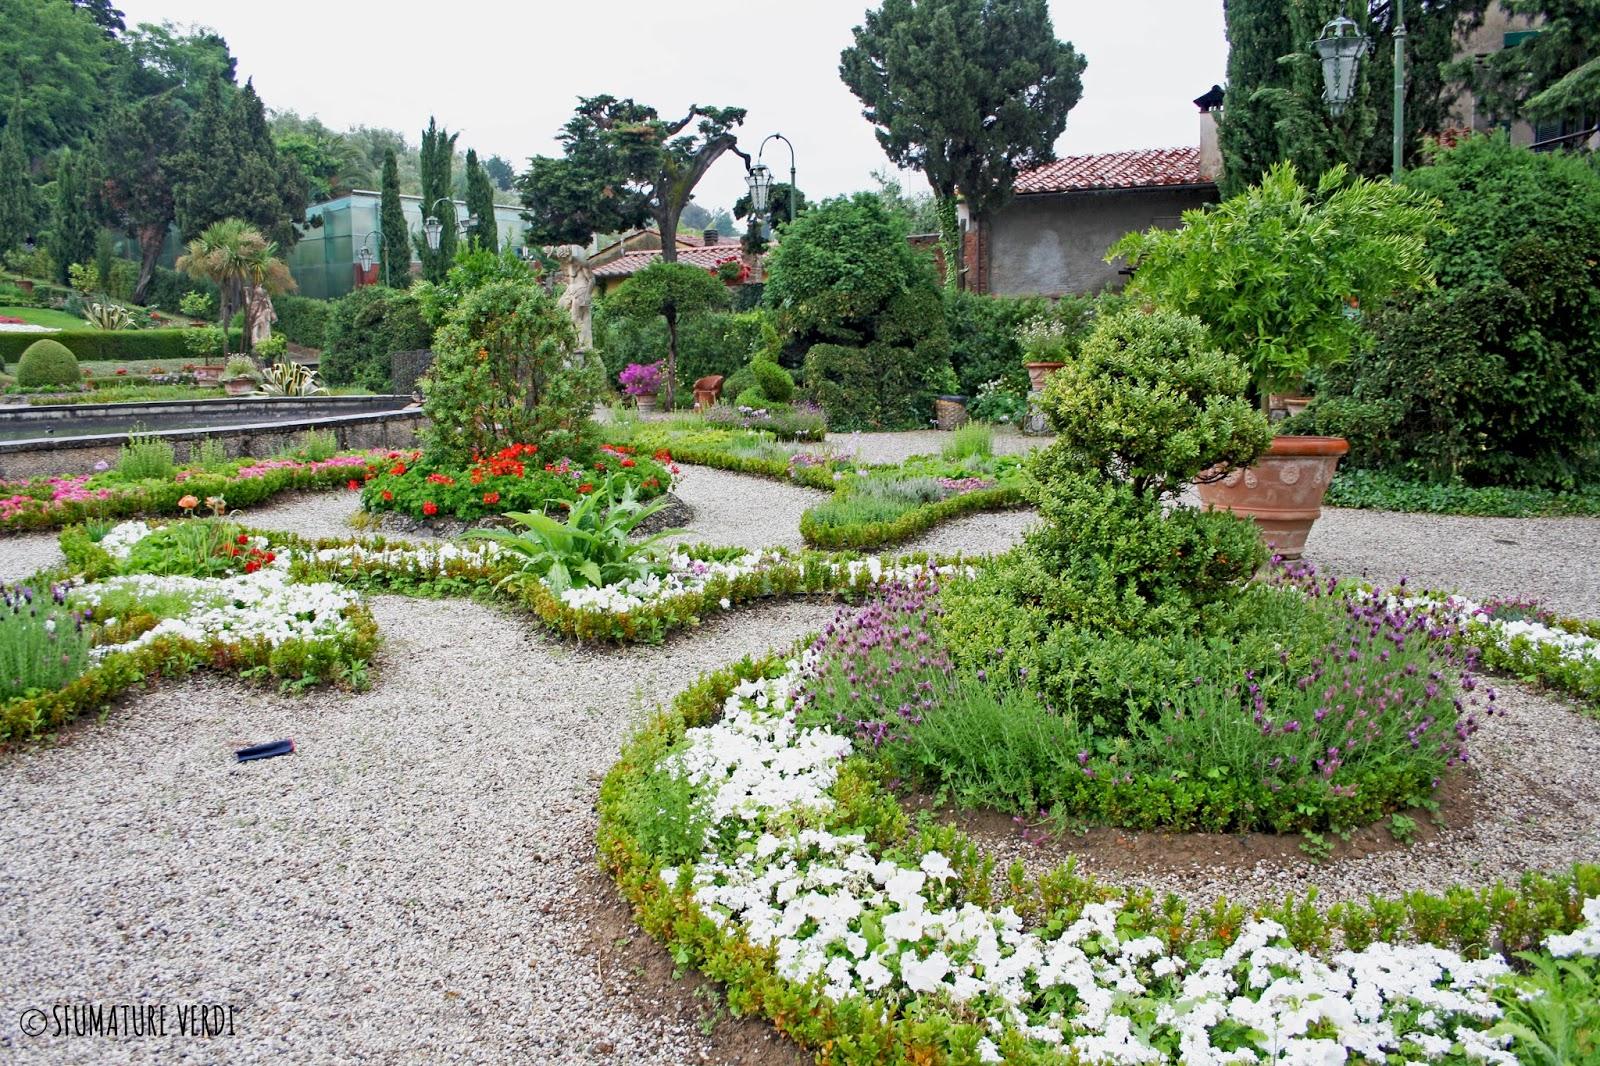 Villa garzoni sfumature verdi for Siepi fiorite perenni